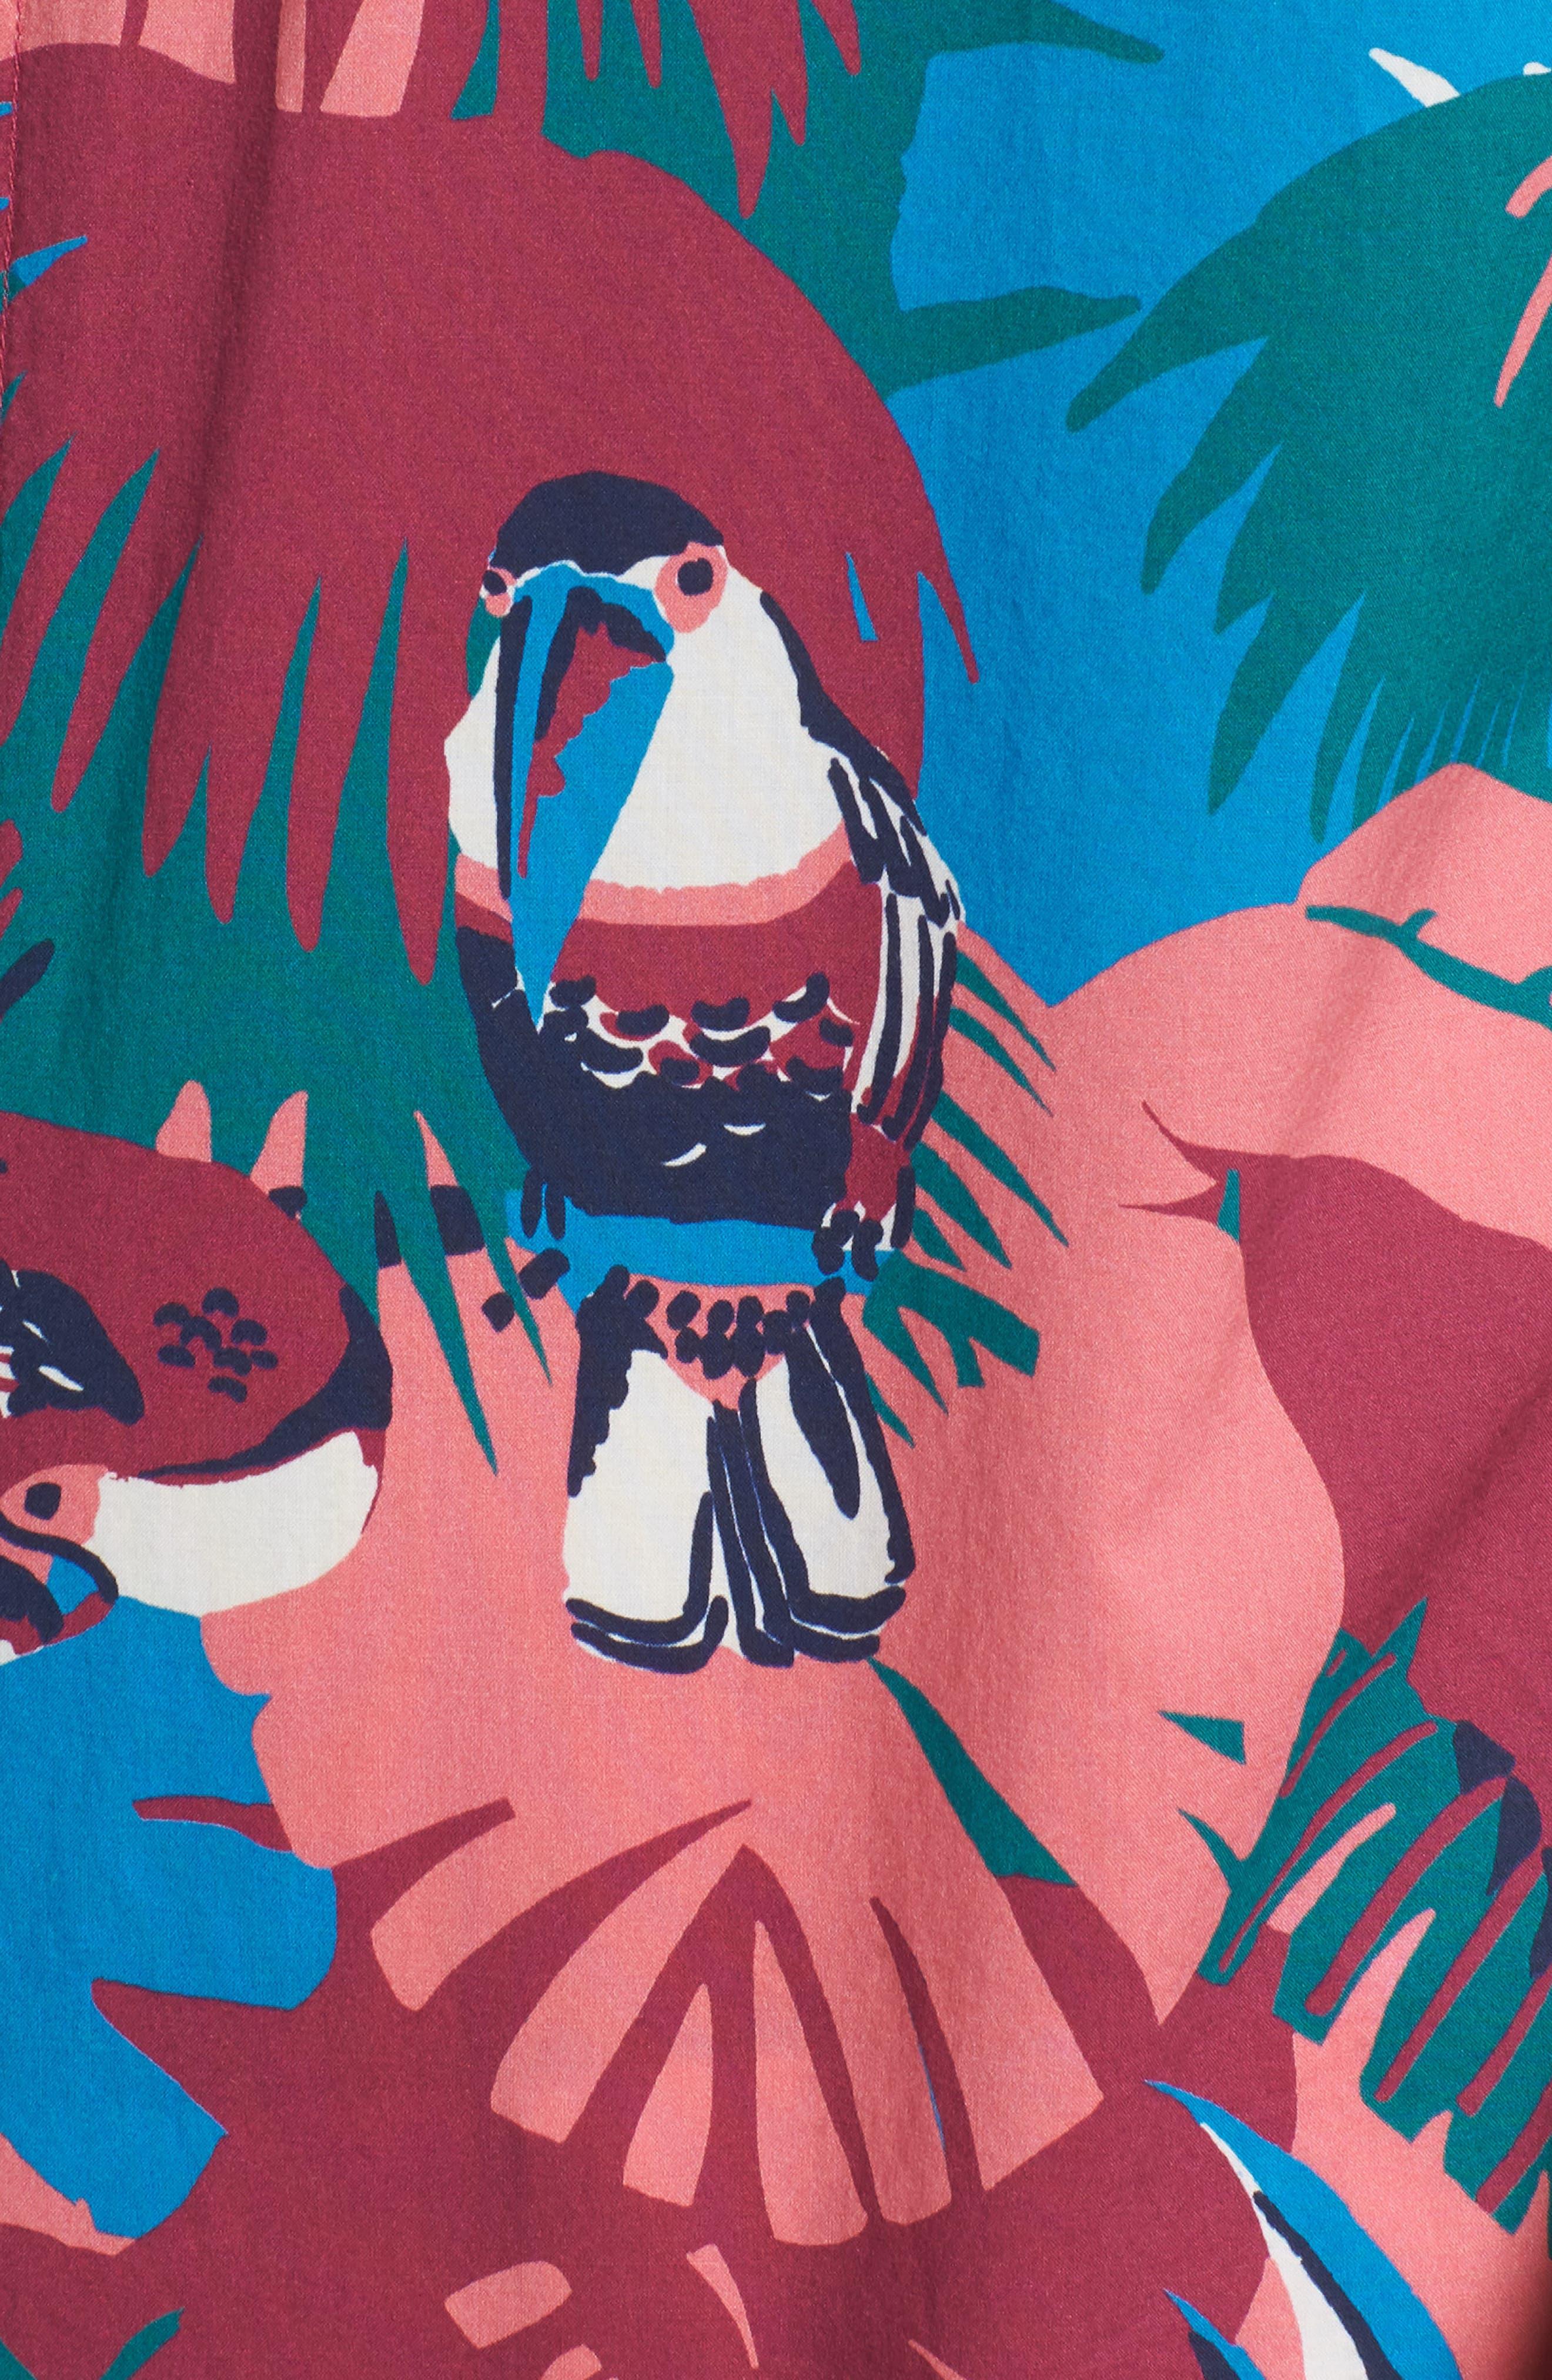 Riviera Slim Fit Toucan Print Sport Shirt,                             Alternate thumbnail 3, color,                             Toucan Tropics - Peony Coral